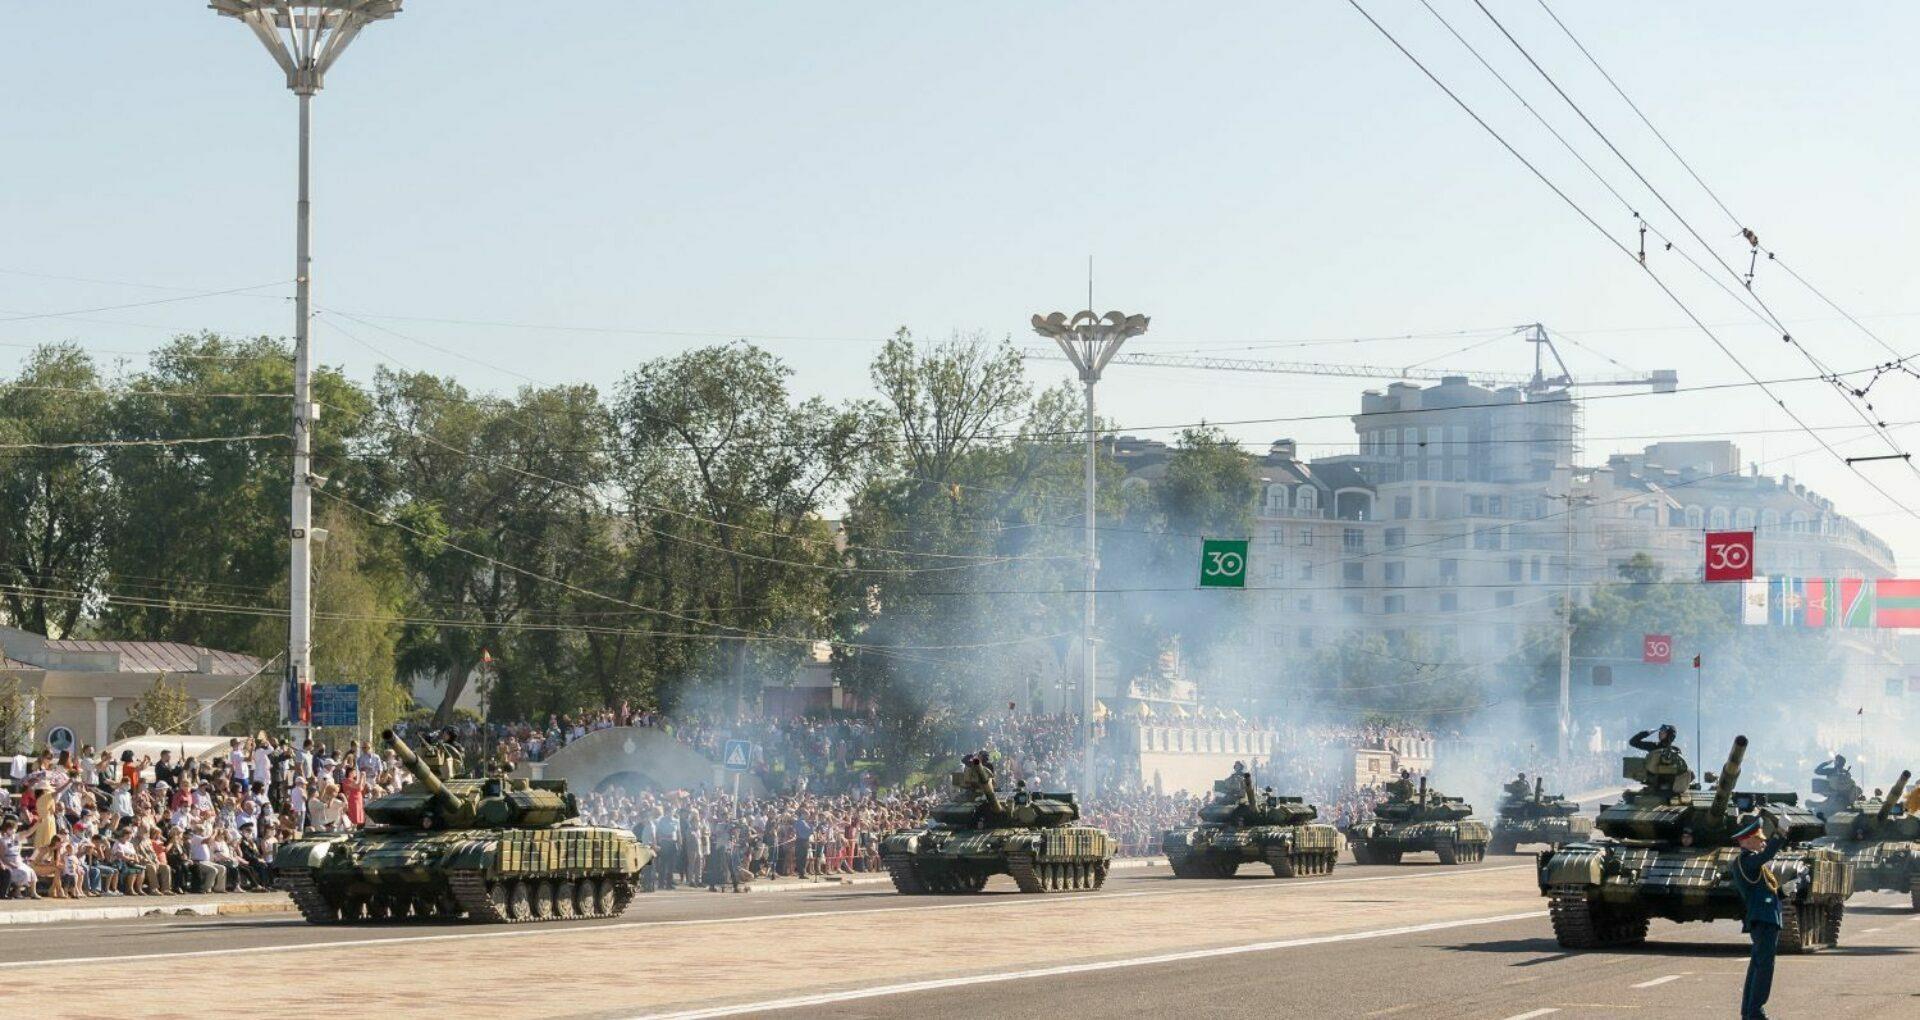 Public Manifestation in Tiraspol City,  Transnistria, Moldova's Breakaway Region